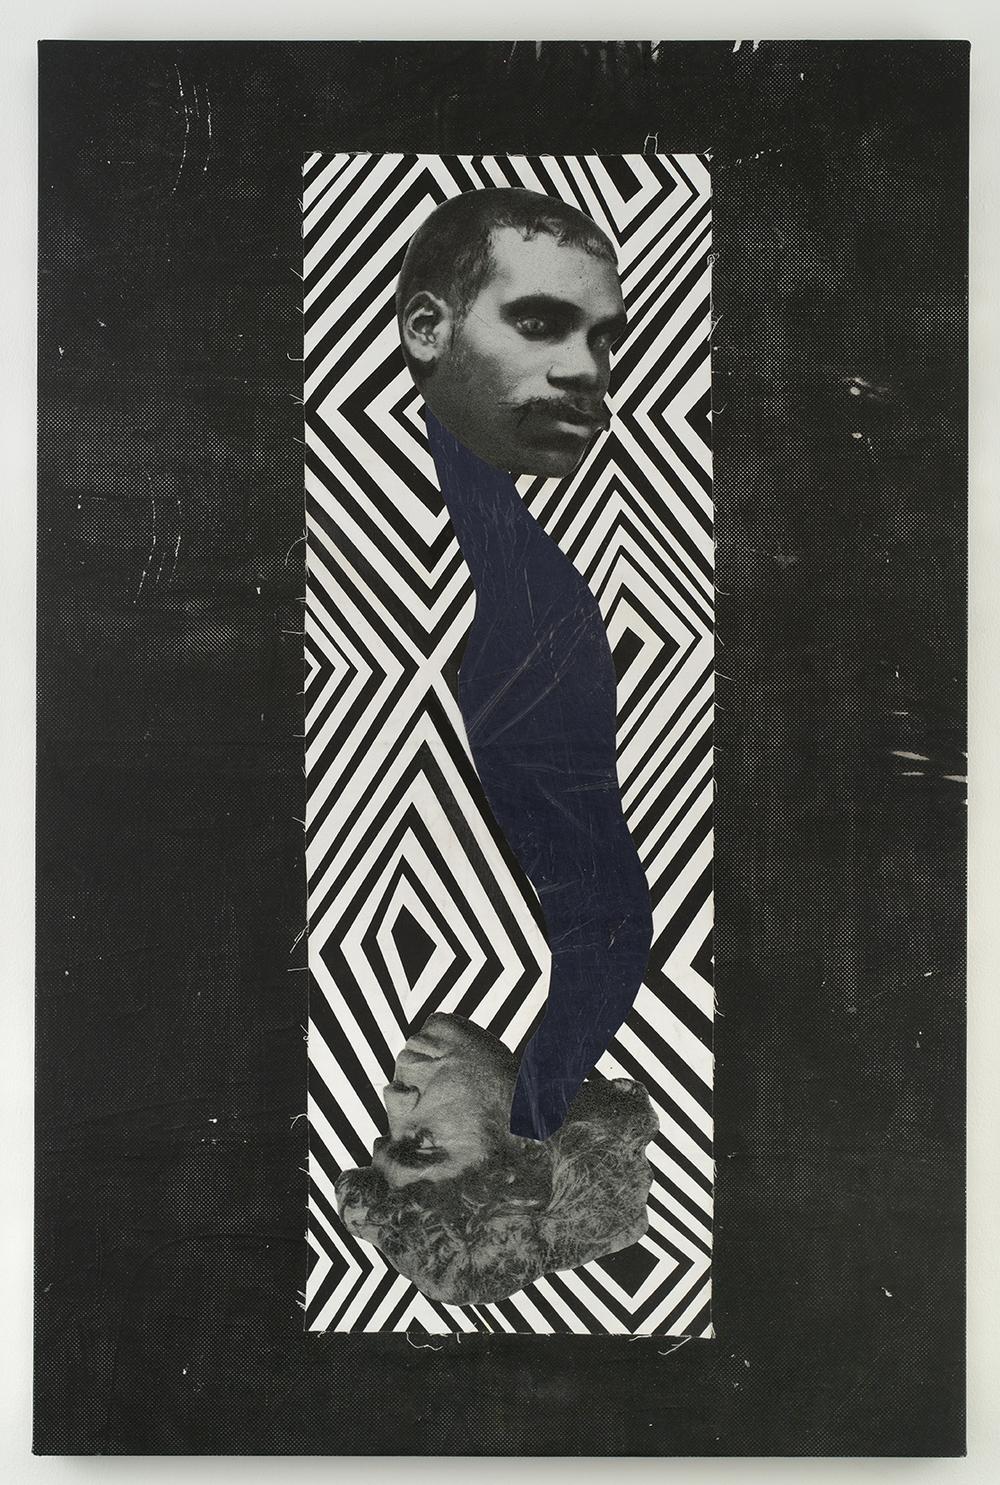 The Snake,  2016  Linen, cotton, acrylic ink, foil  167 x 110 x 5 cm